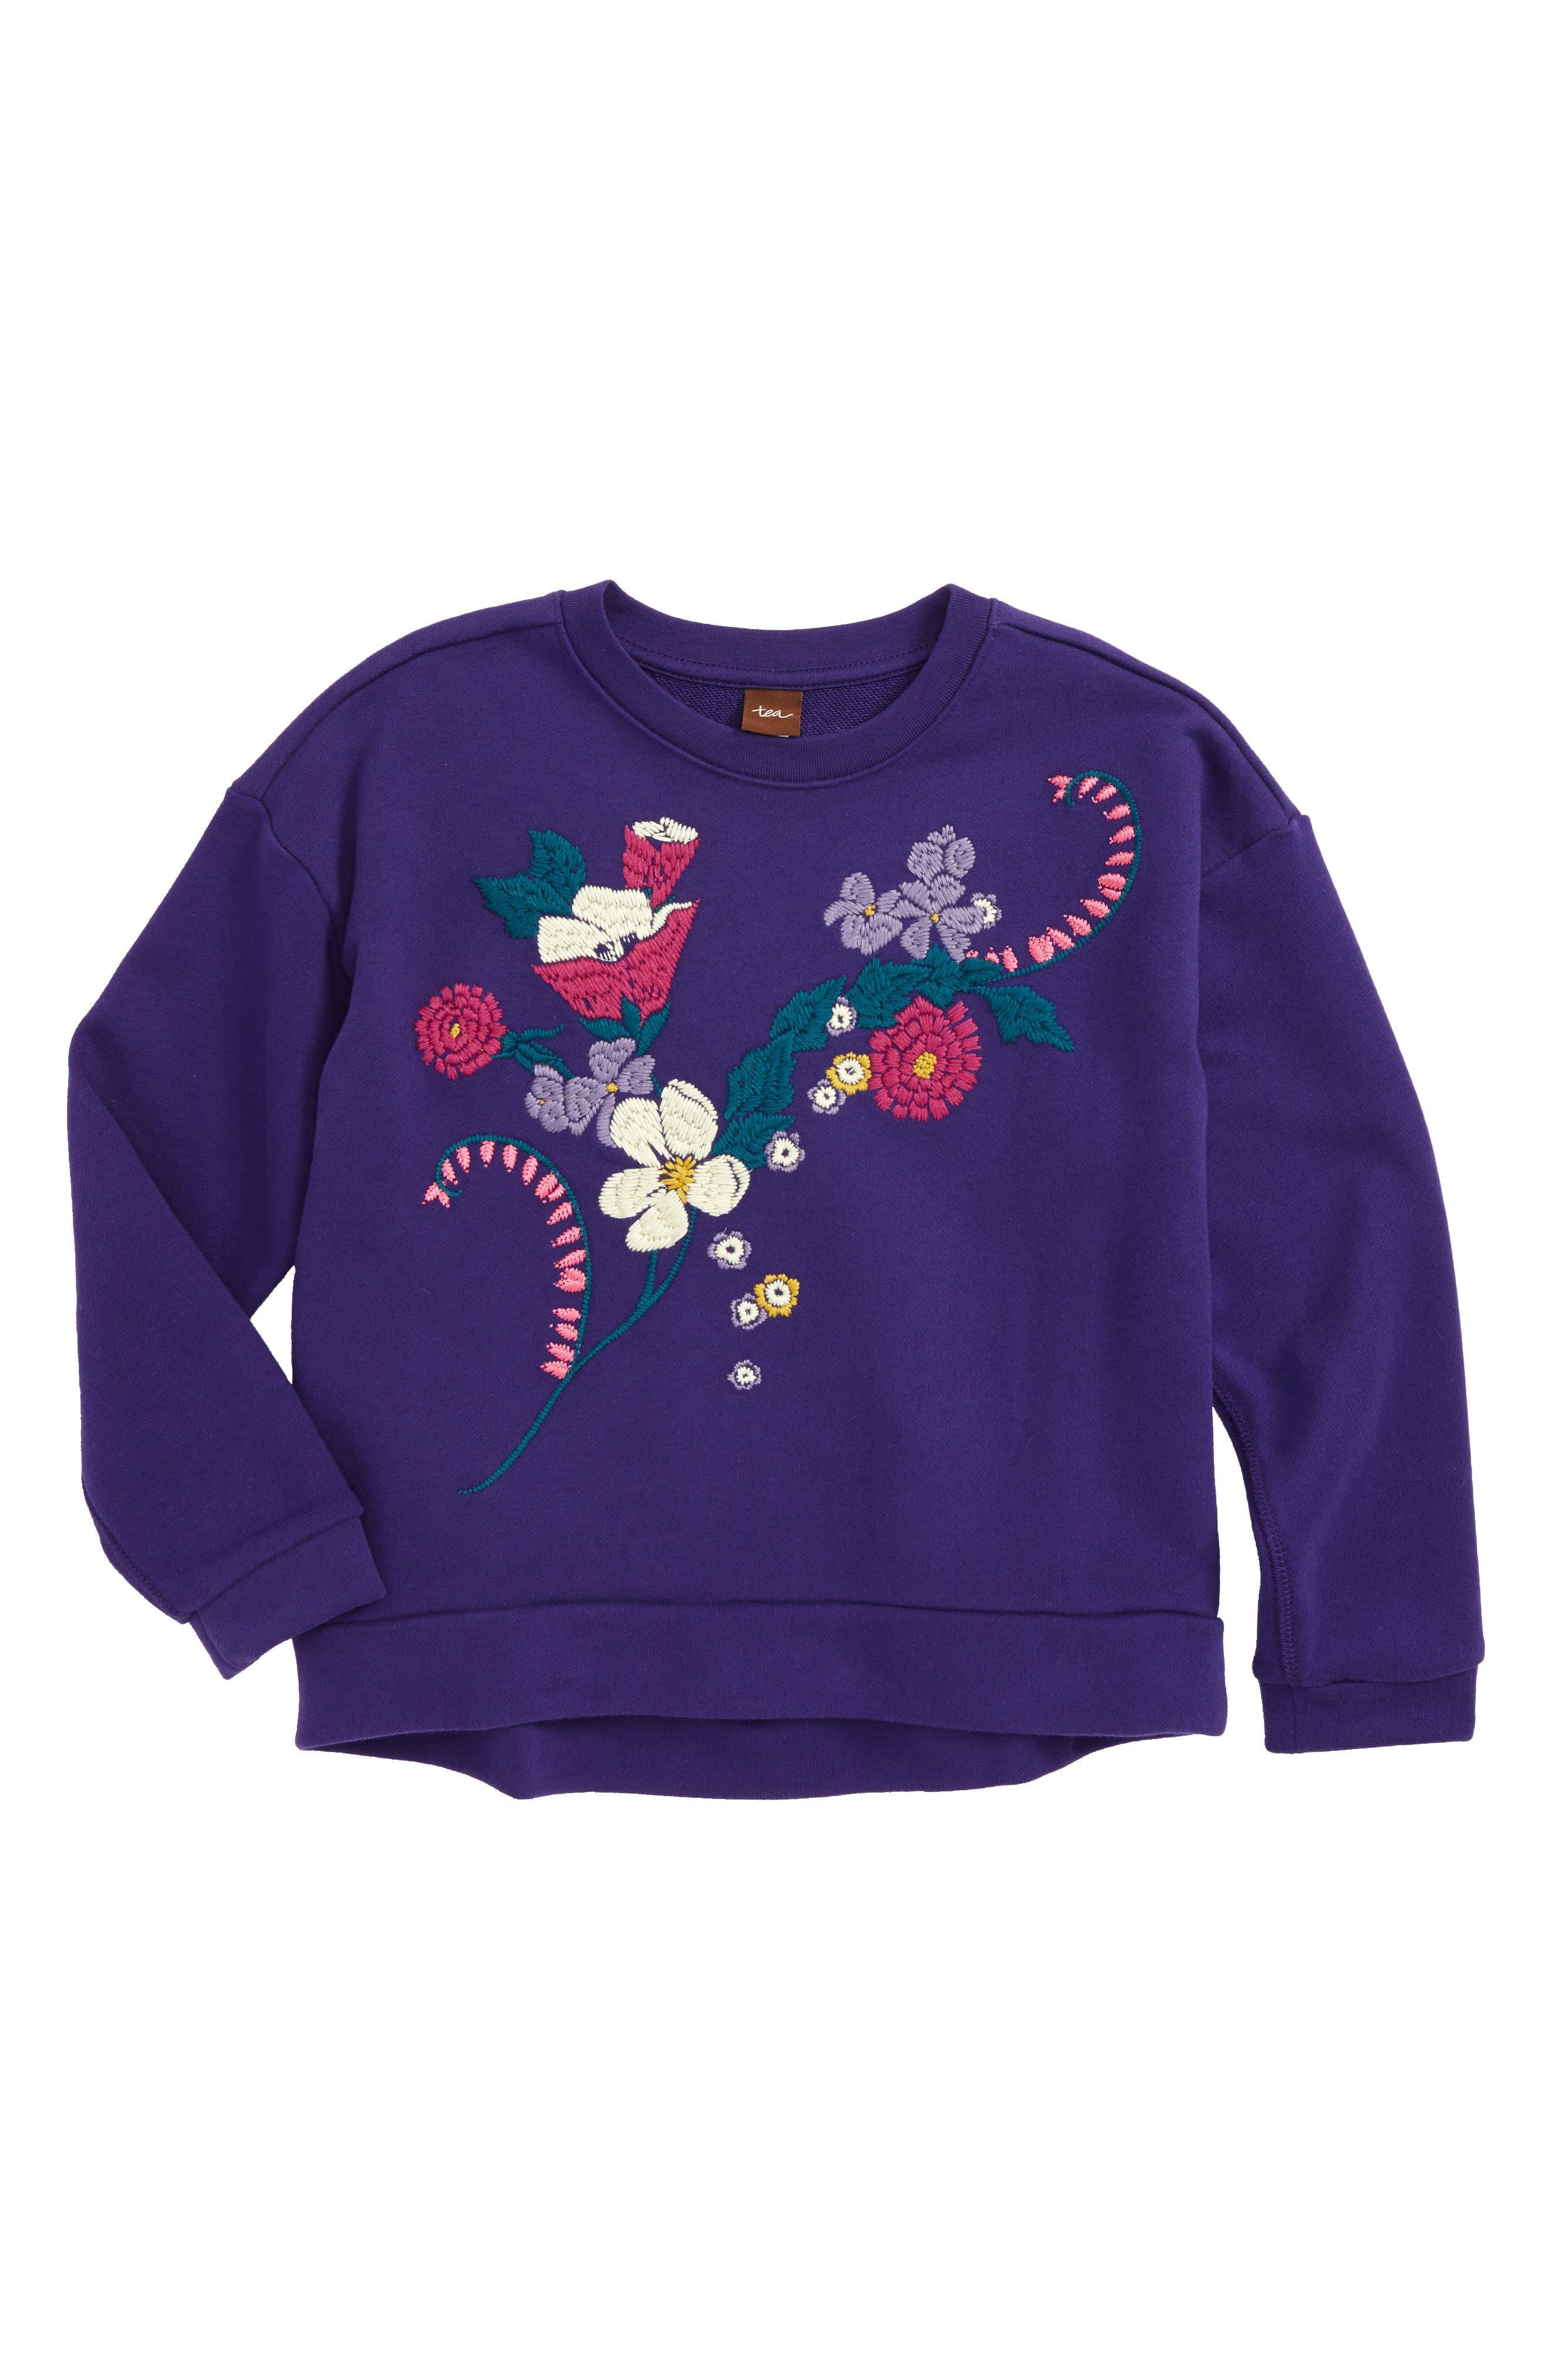 Alternate Image 1 Selected - Tea Collection Primrose Embroidered Sweatshirt (Toddler Girls, Little Girls & Big Girls)